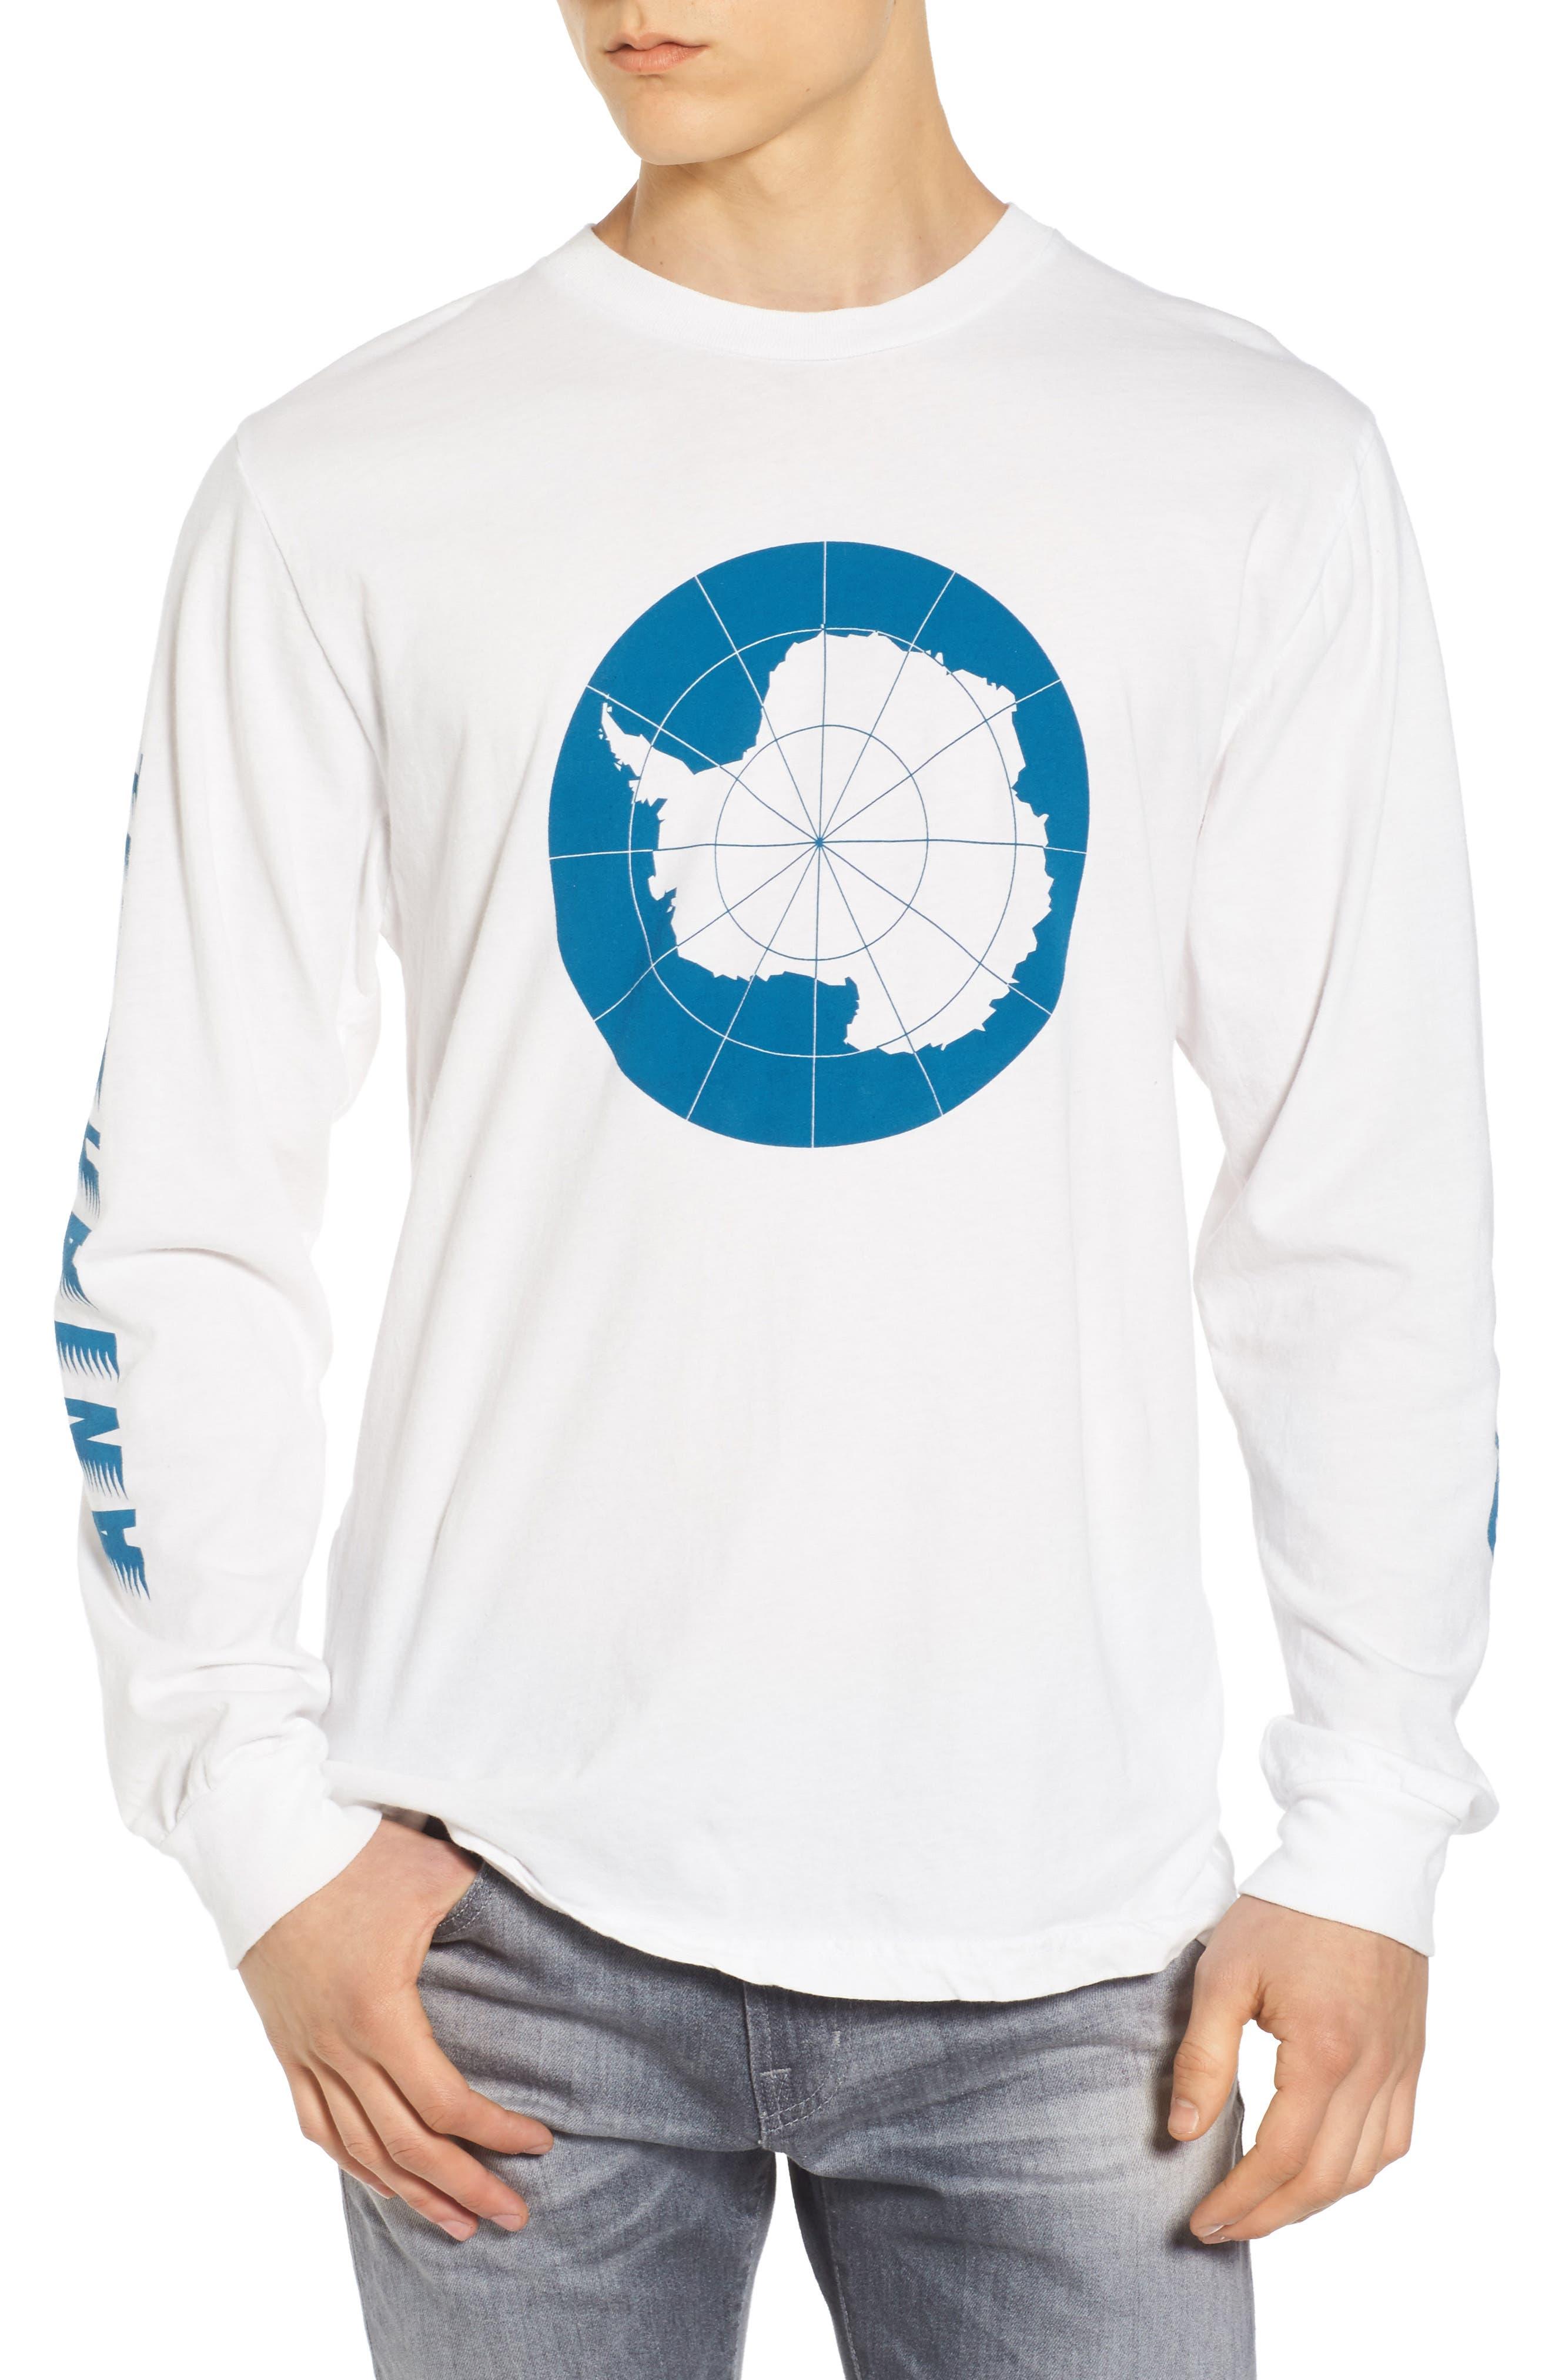 Main Image - Altru Arctic Ski Club T-Shirt